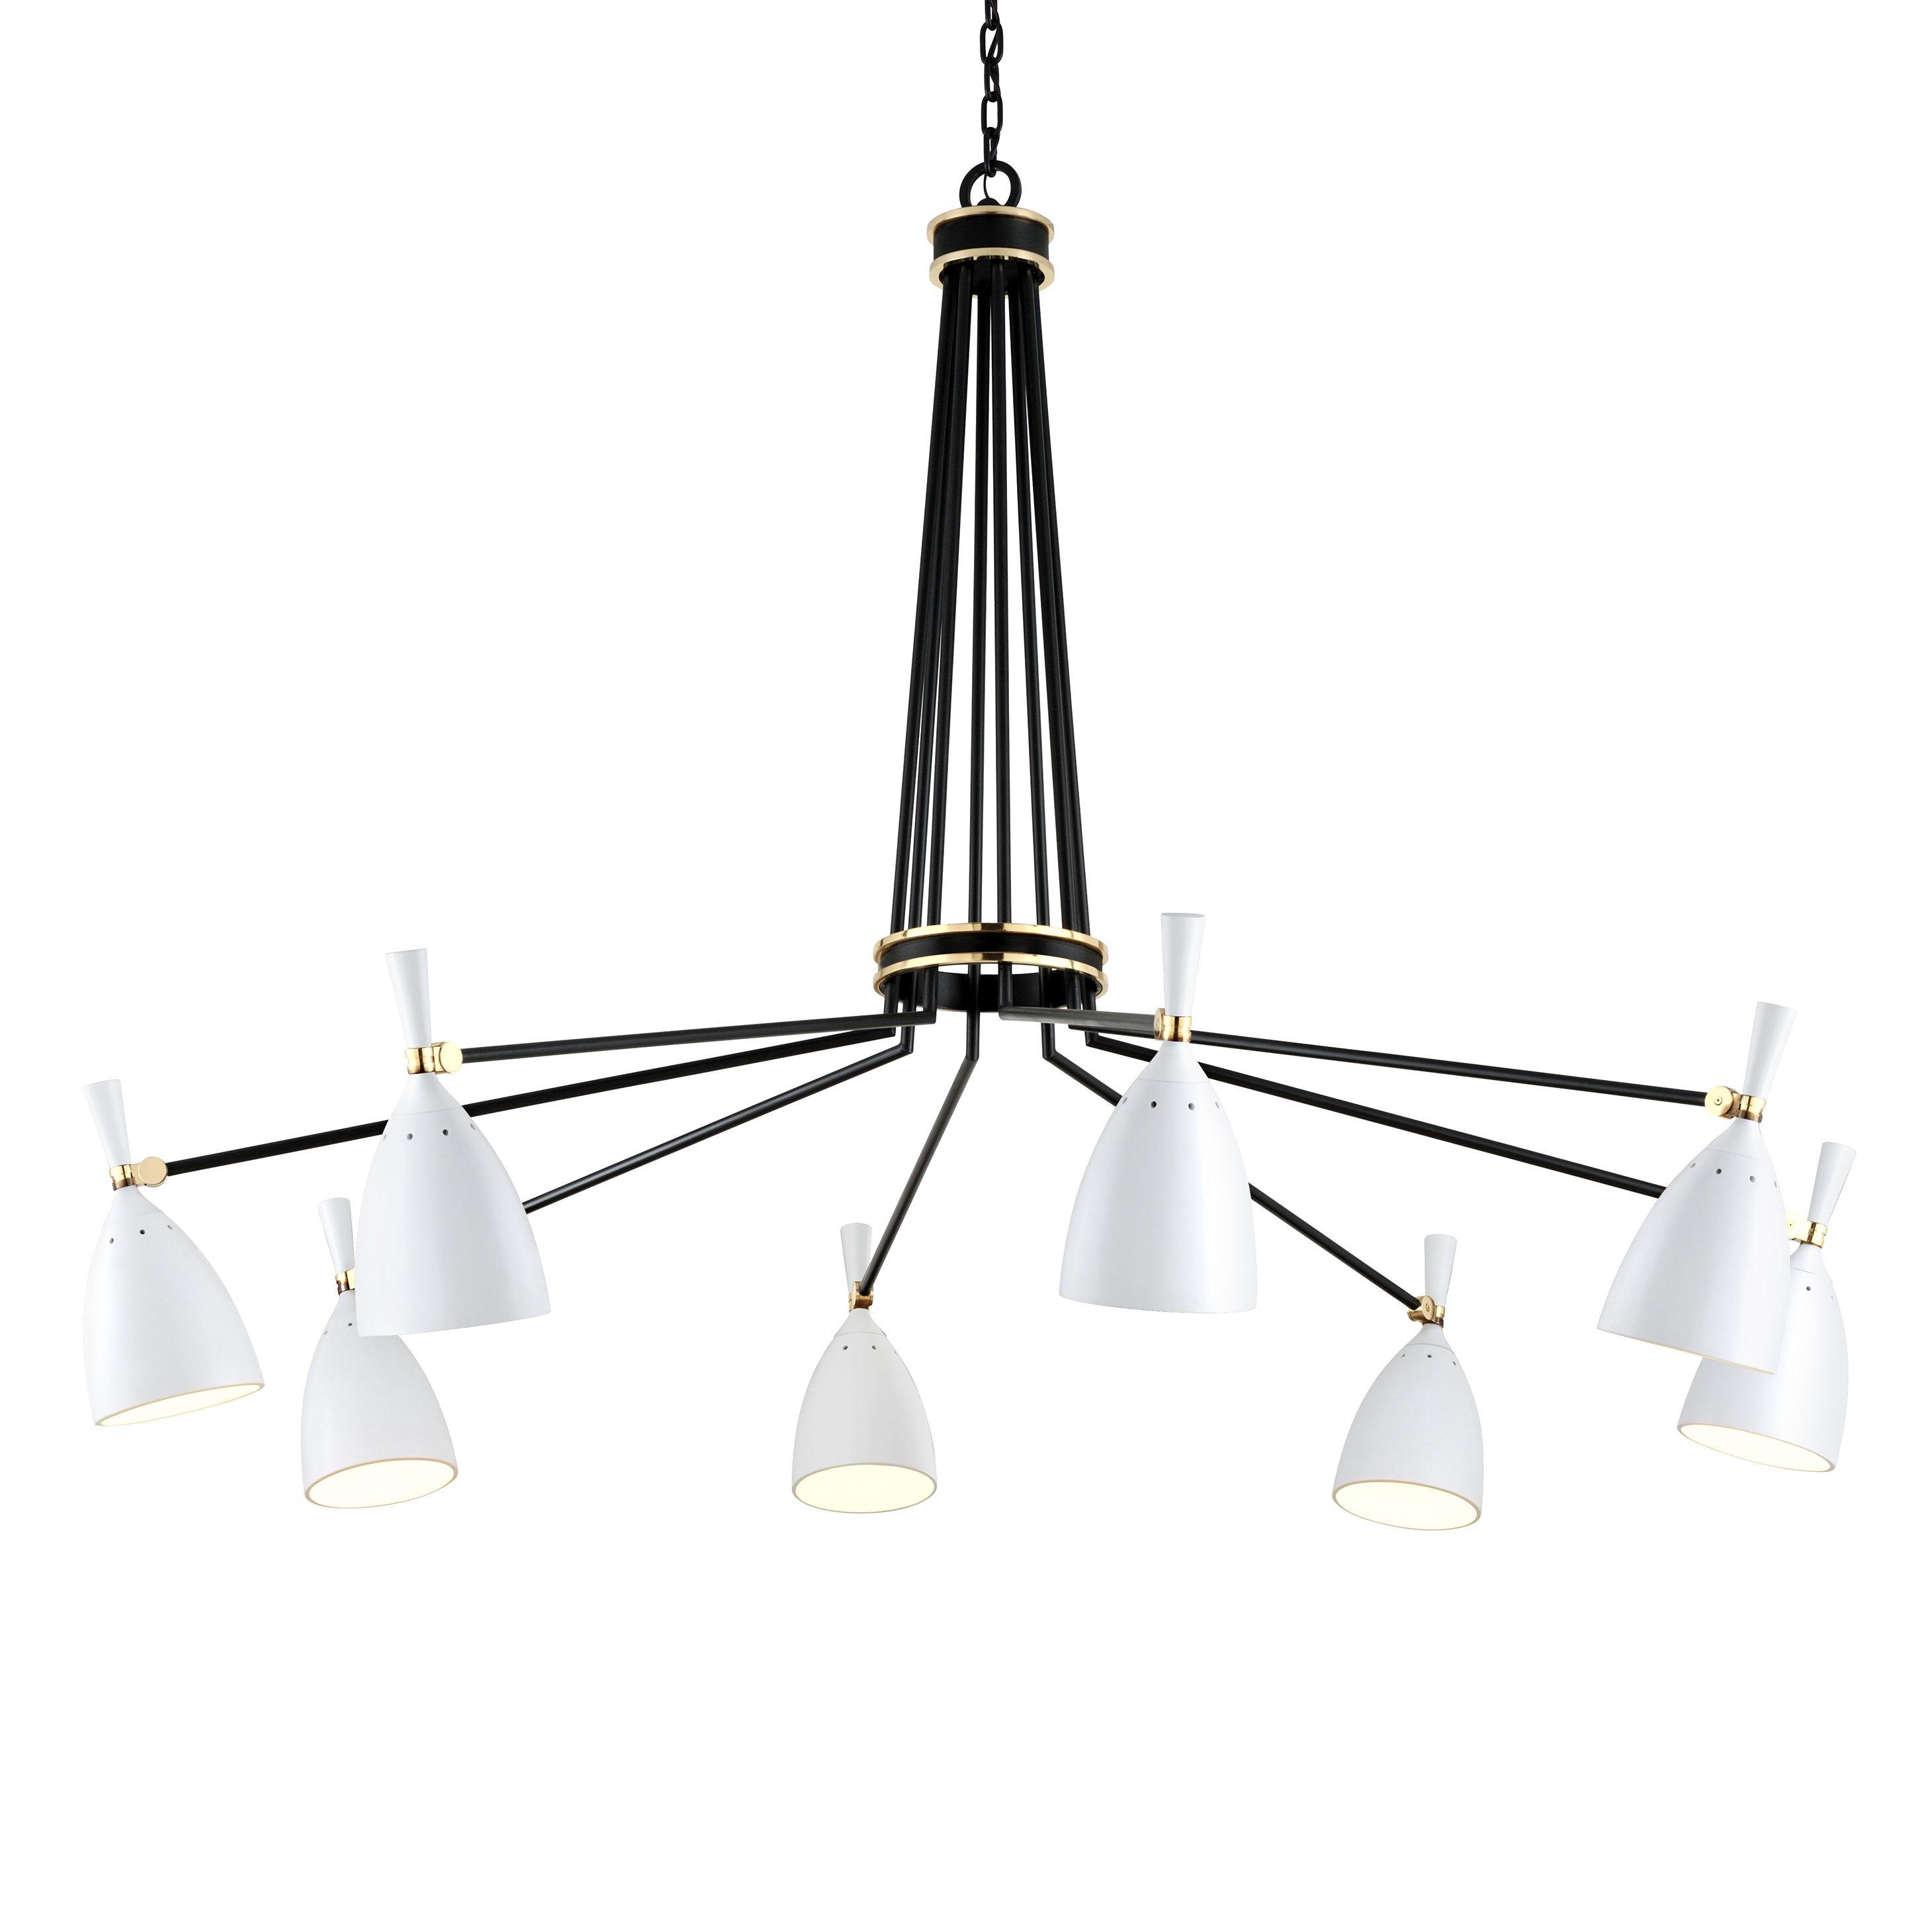 Corbett Lighting 281 08